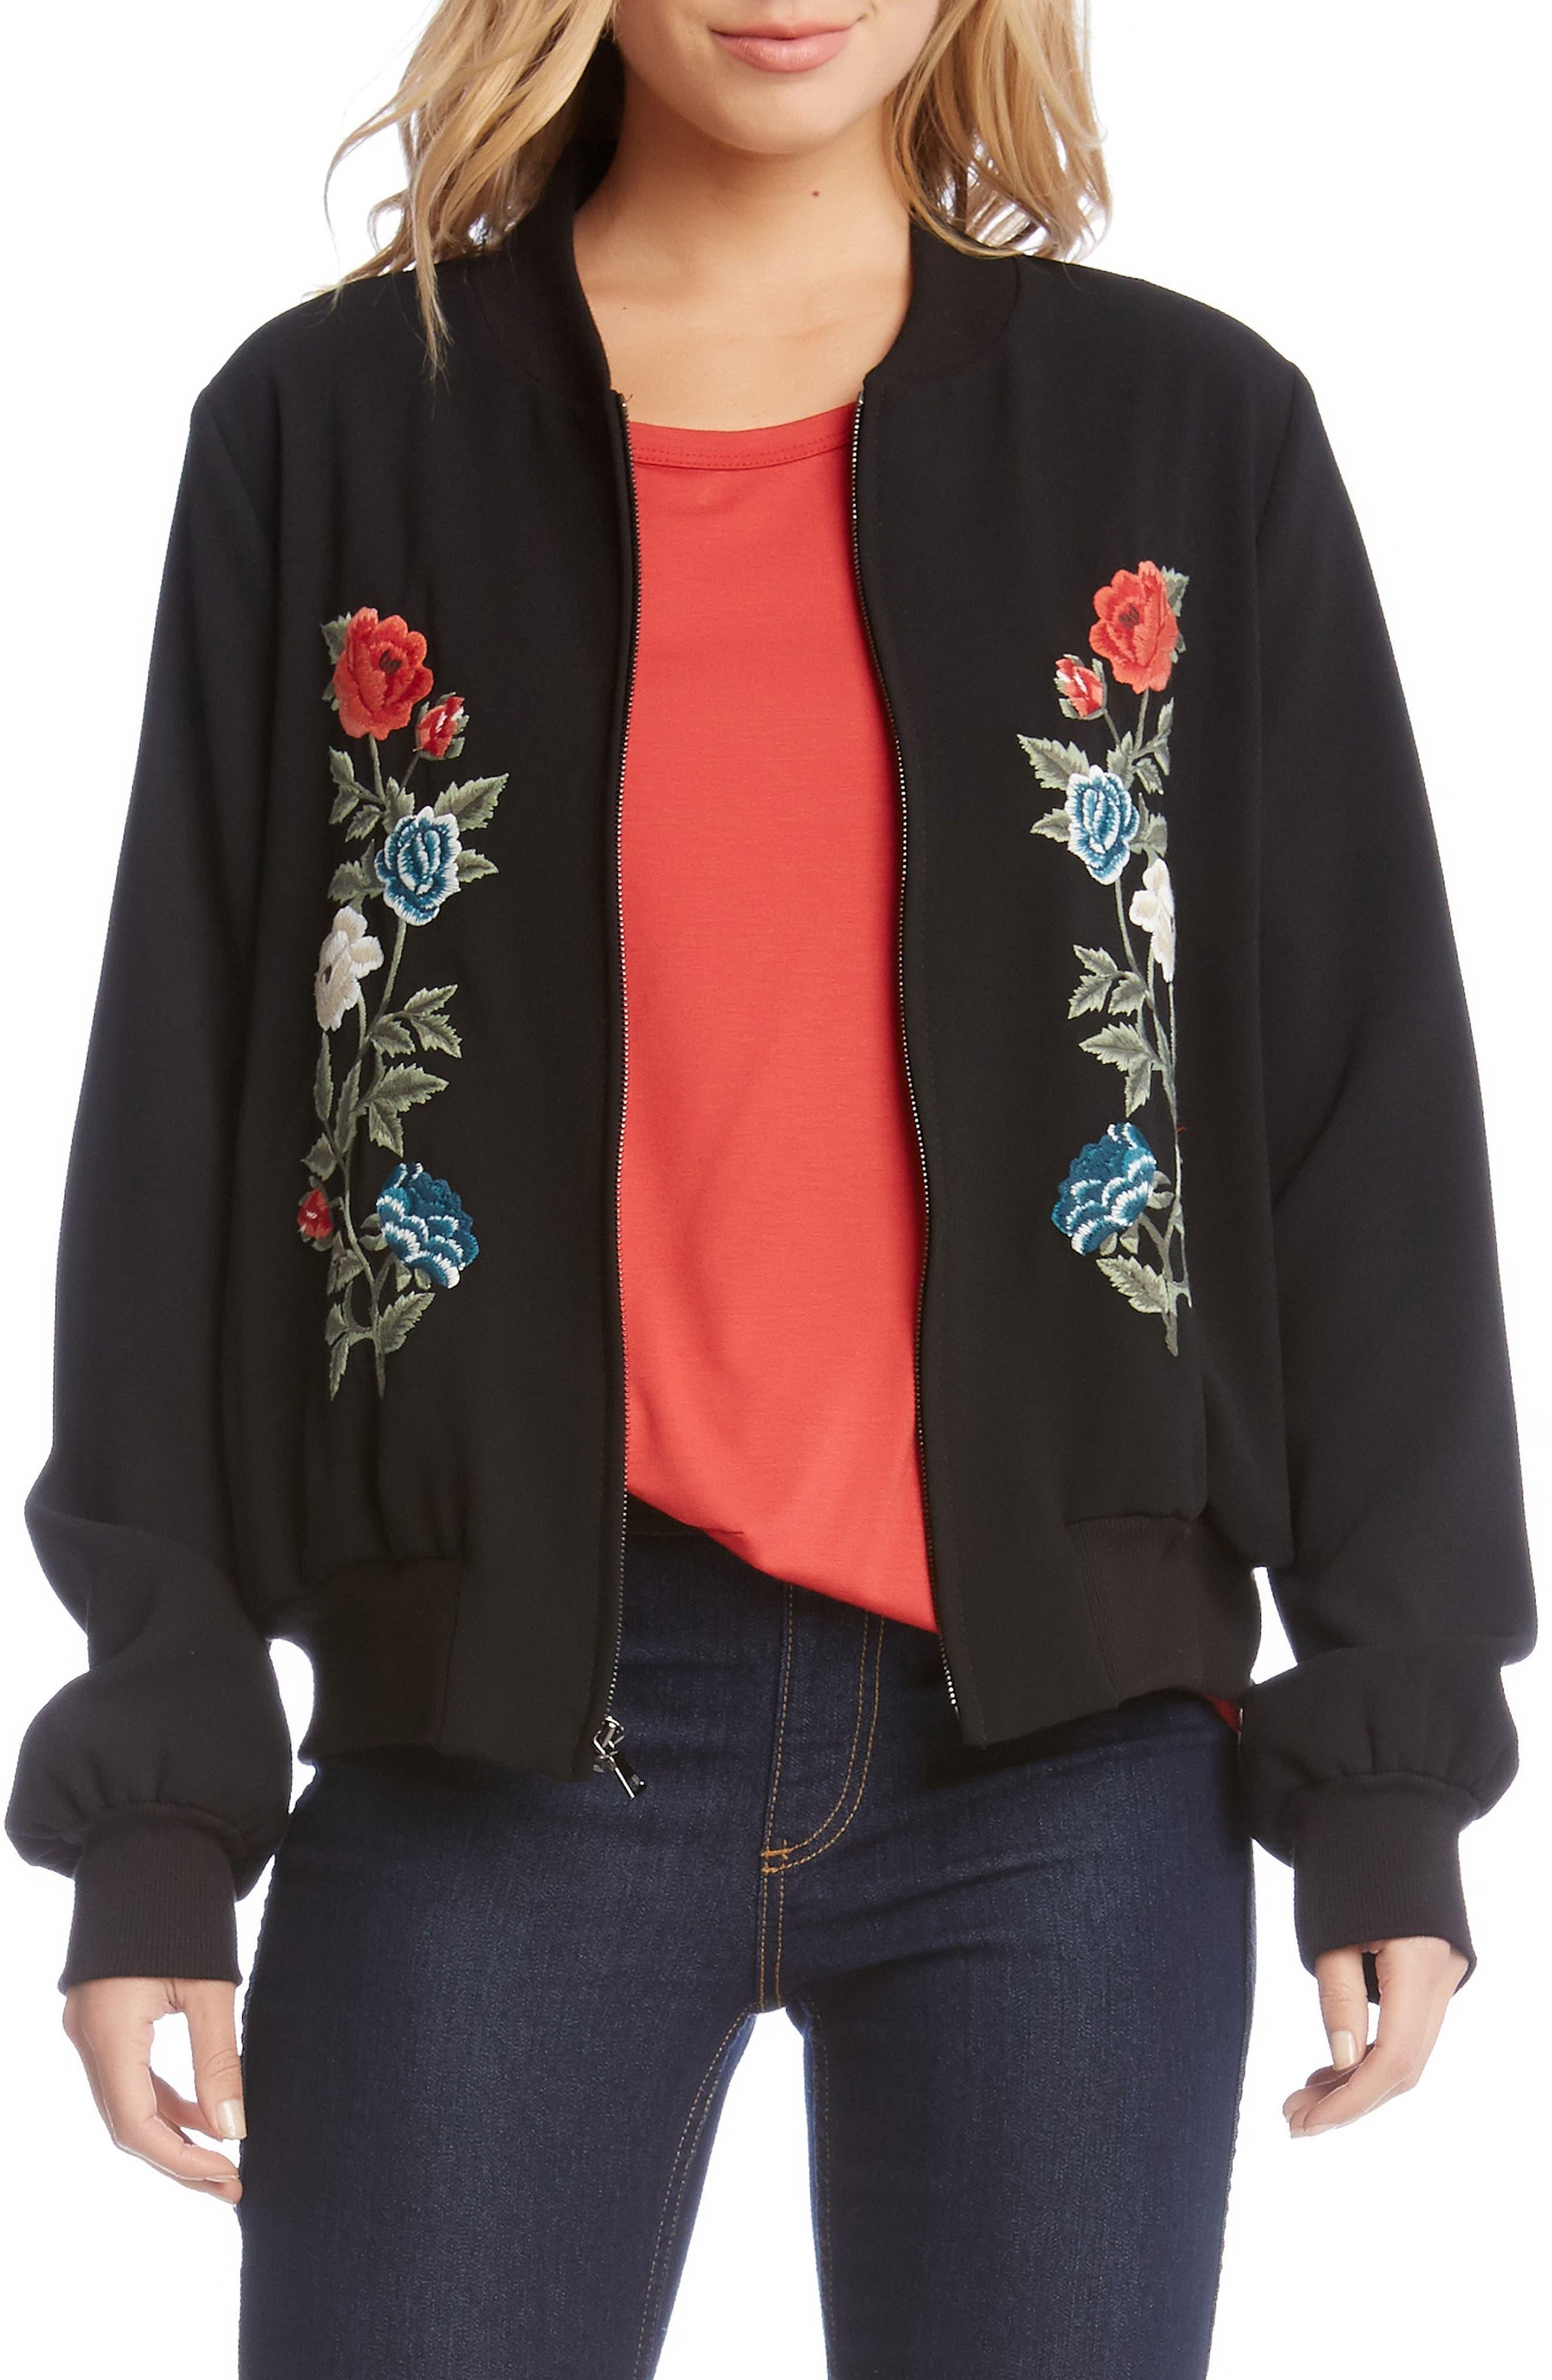 Main Image - Karen Kane Embroidered Bomber Jacket